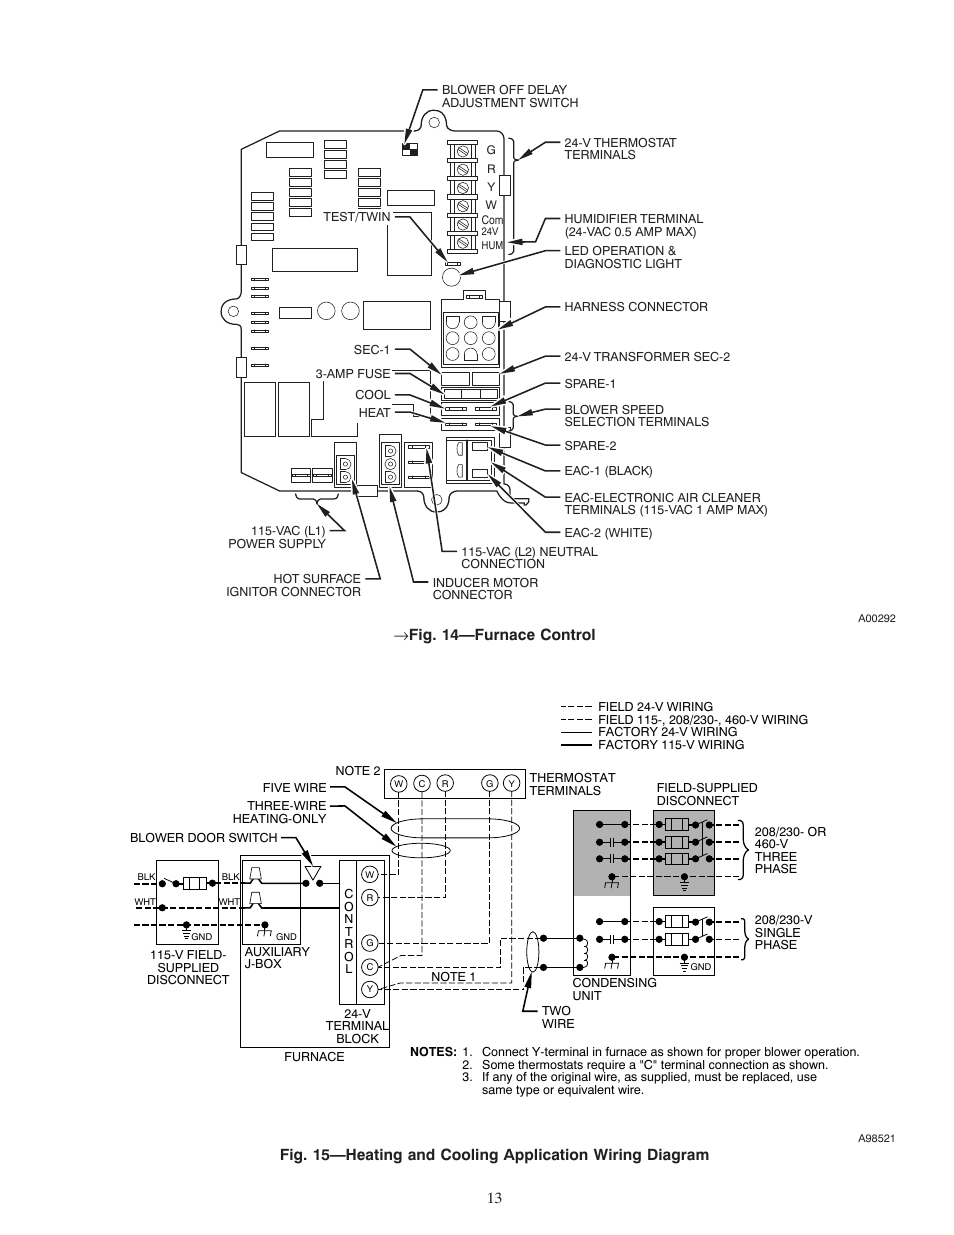 General Wiring Diagram : General electric furnace wiring diagram eb